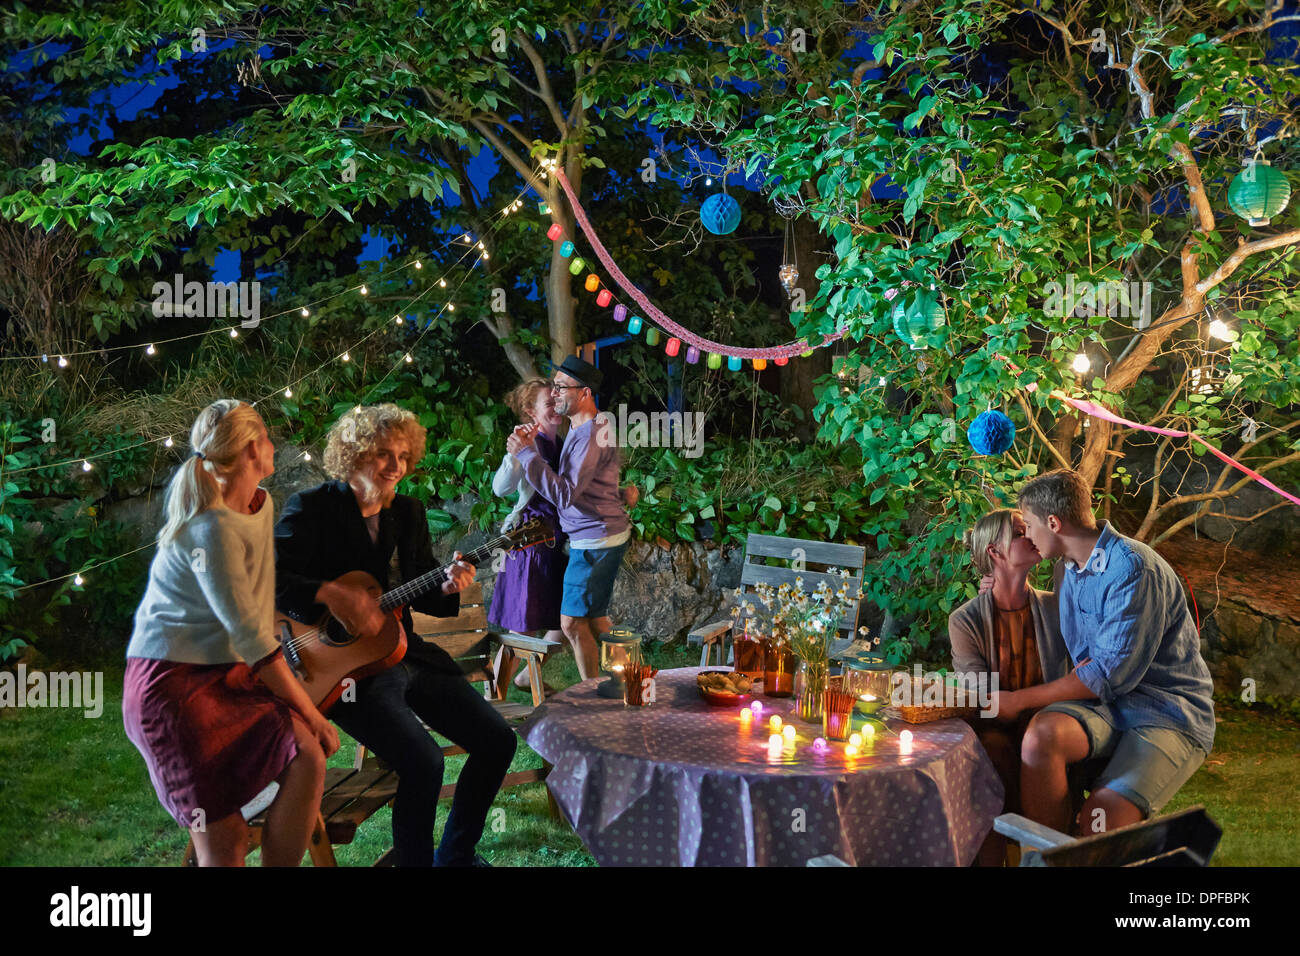 Three couples having fun at garden party at night - Stock Image